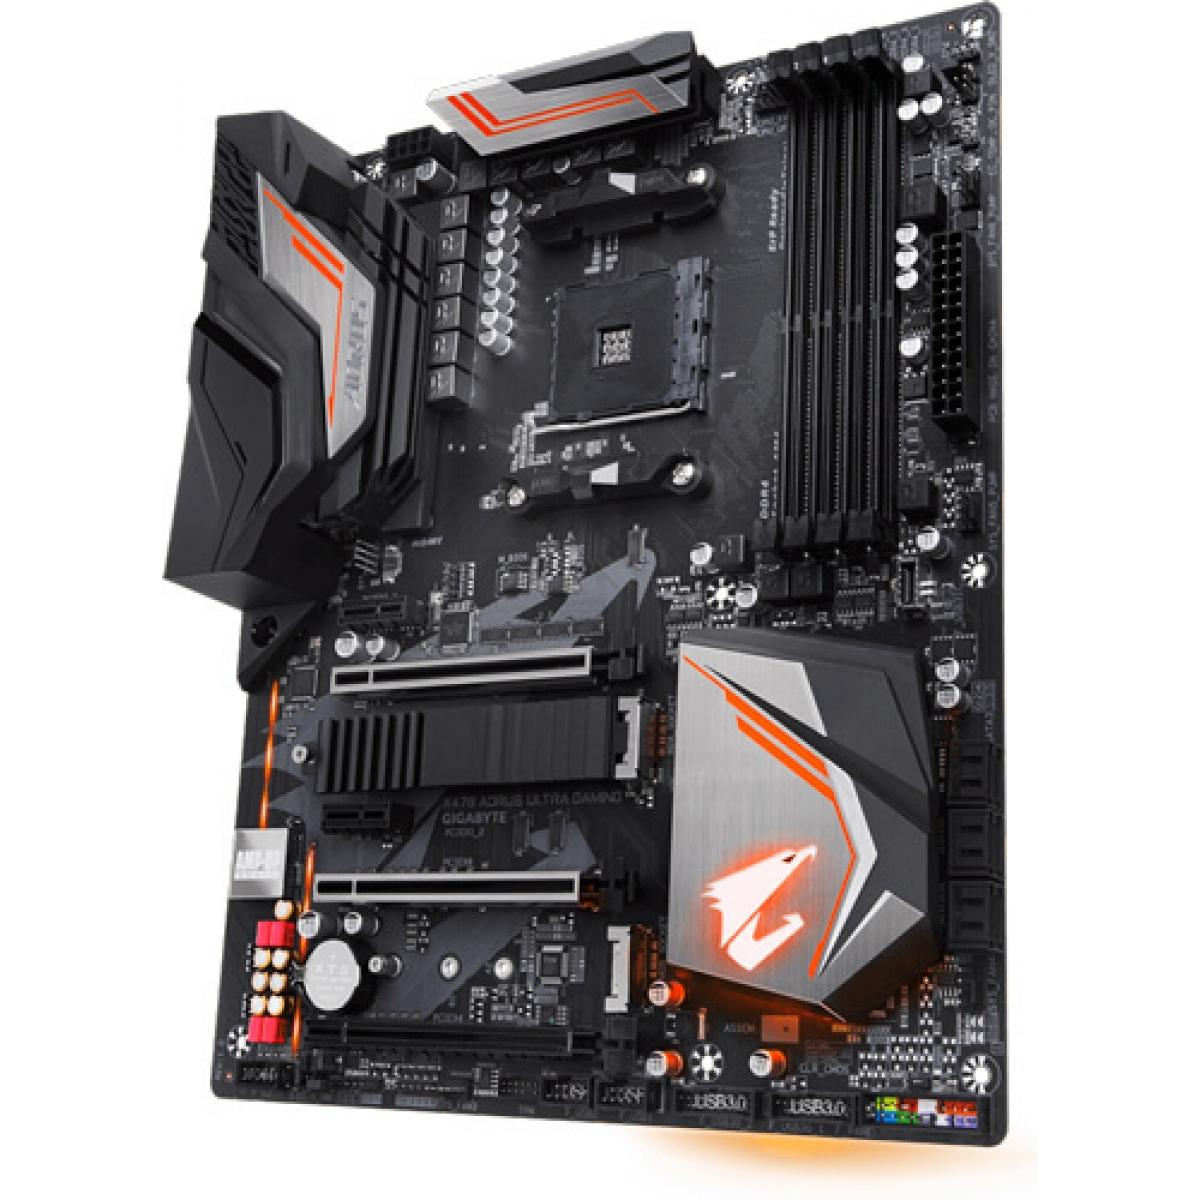 Placa Mãe Gigabyte X470 Aorus Ultra Gaming, Chipset X470, AMD AM4, ATX, DDR4